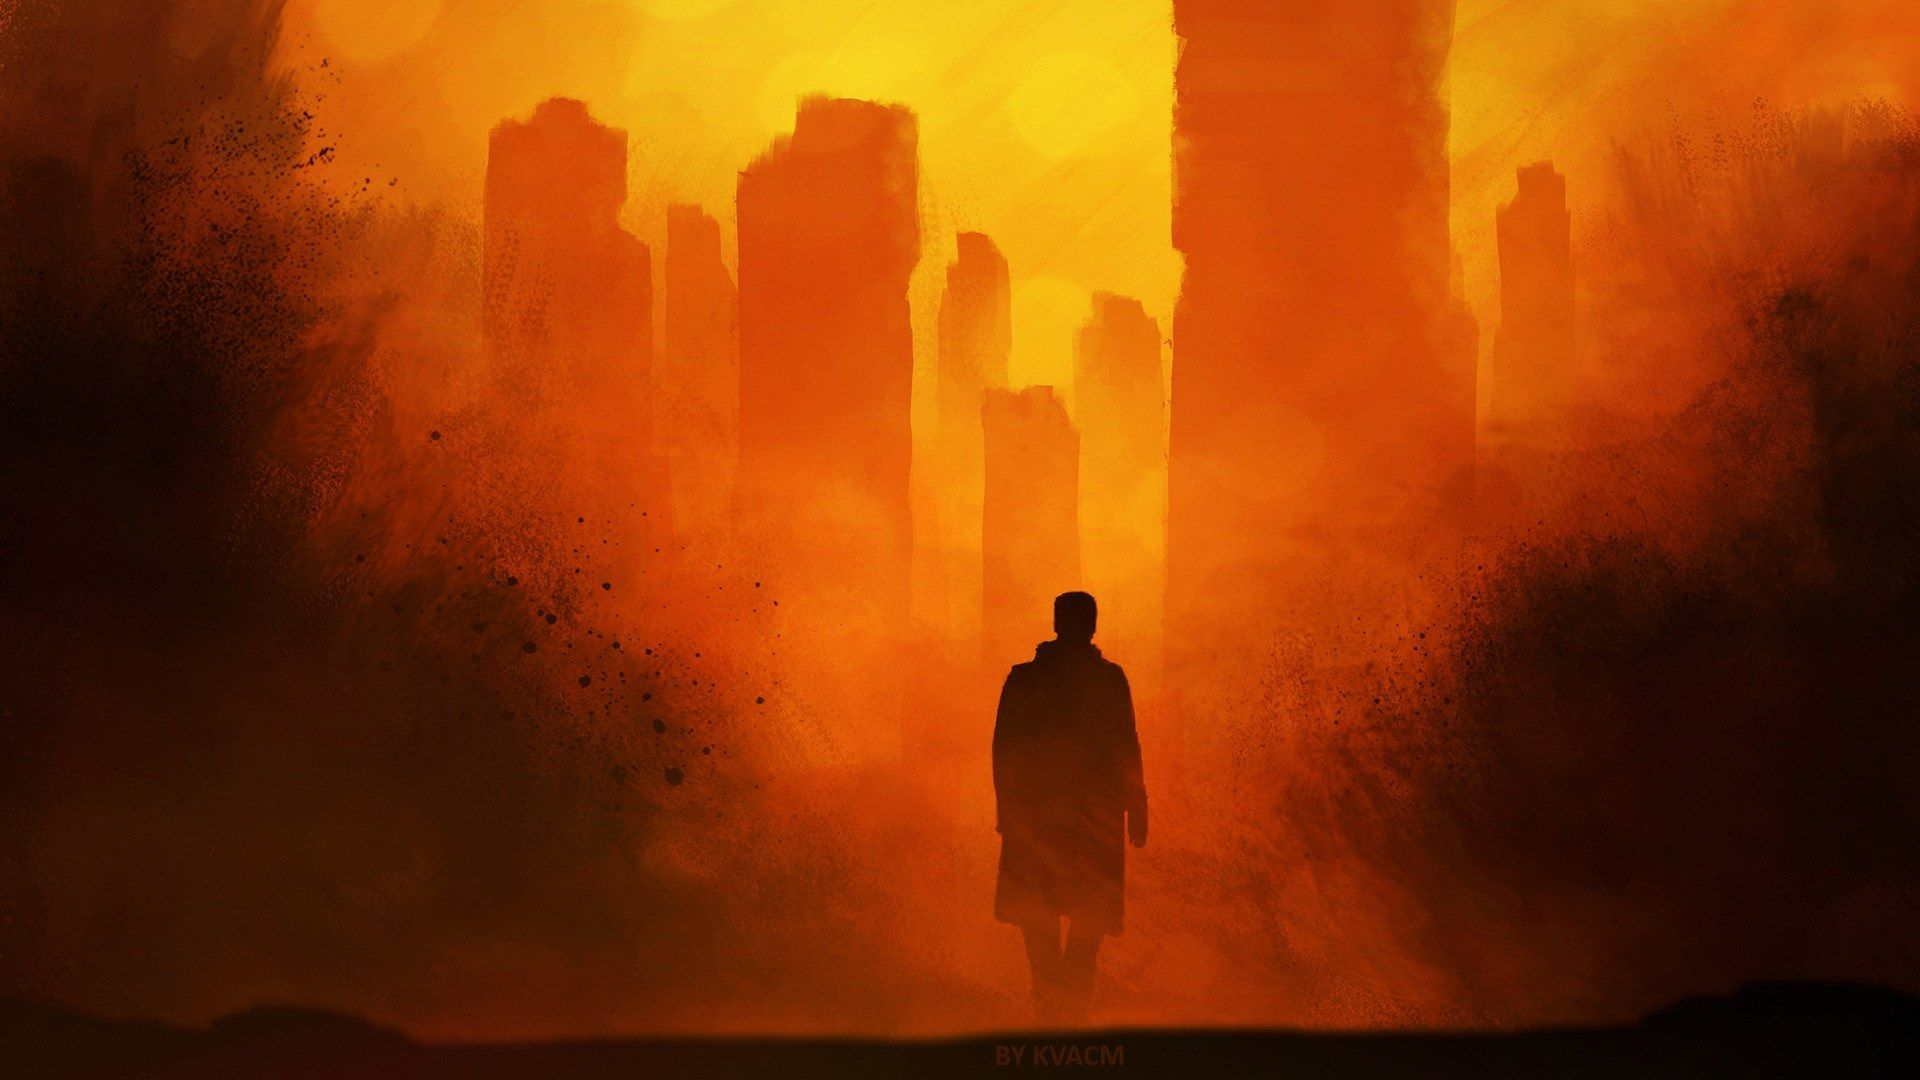 1920x1080 Blade Runner 2049 Hd Background Blade Runner Wallpaper Blade Runner City Artwork